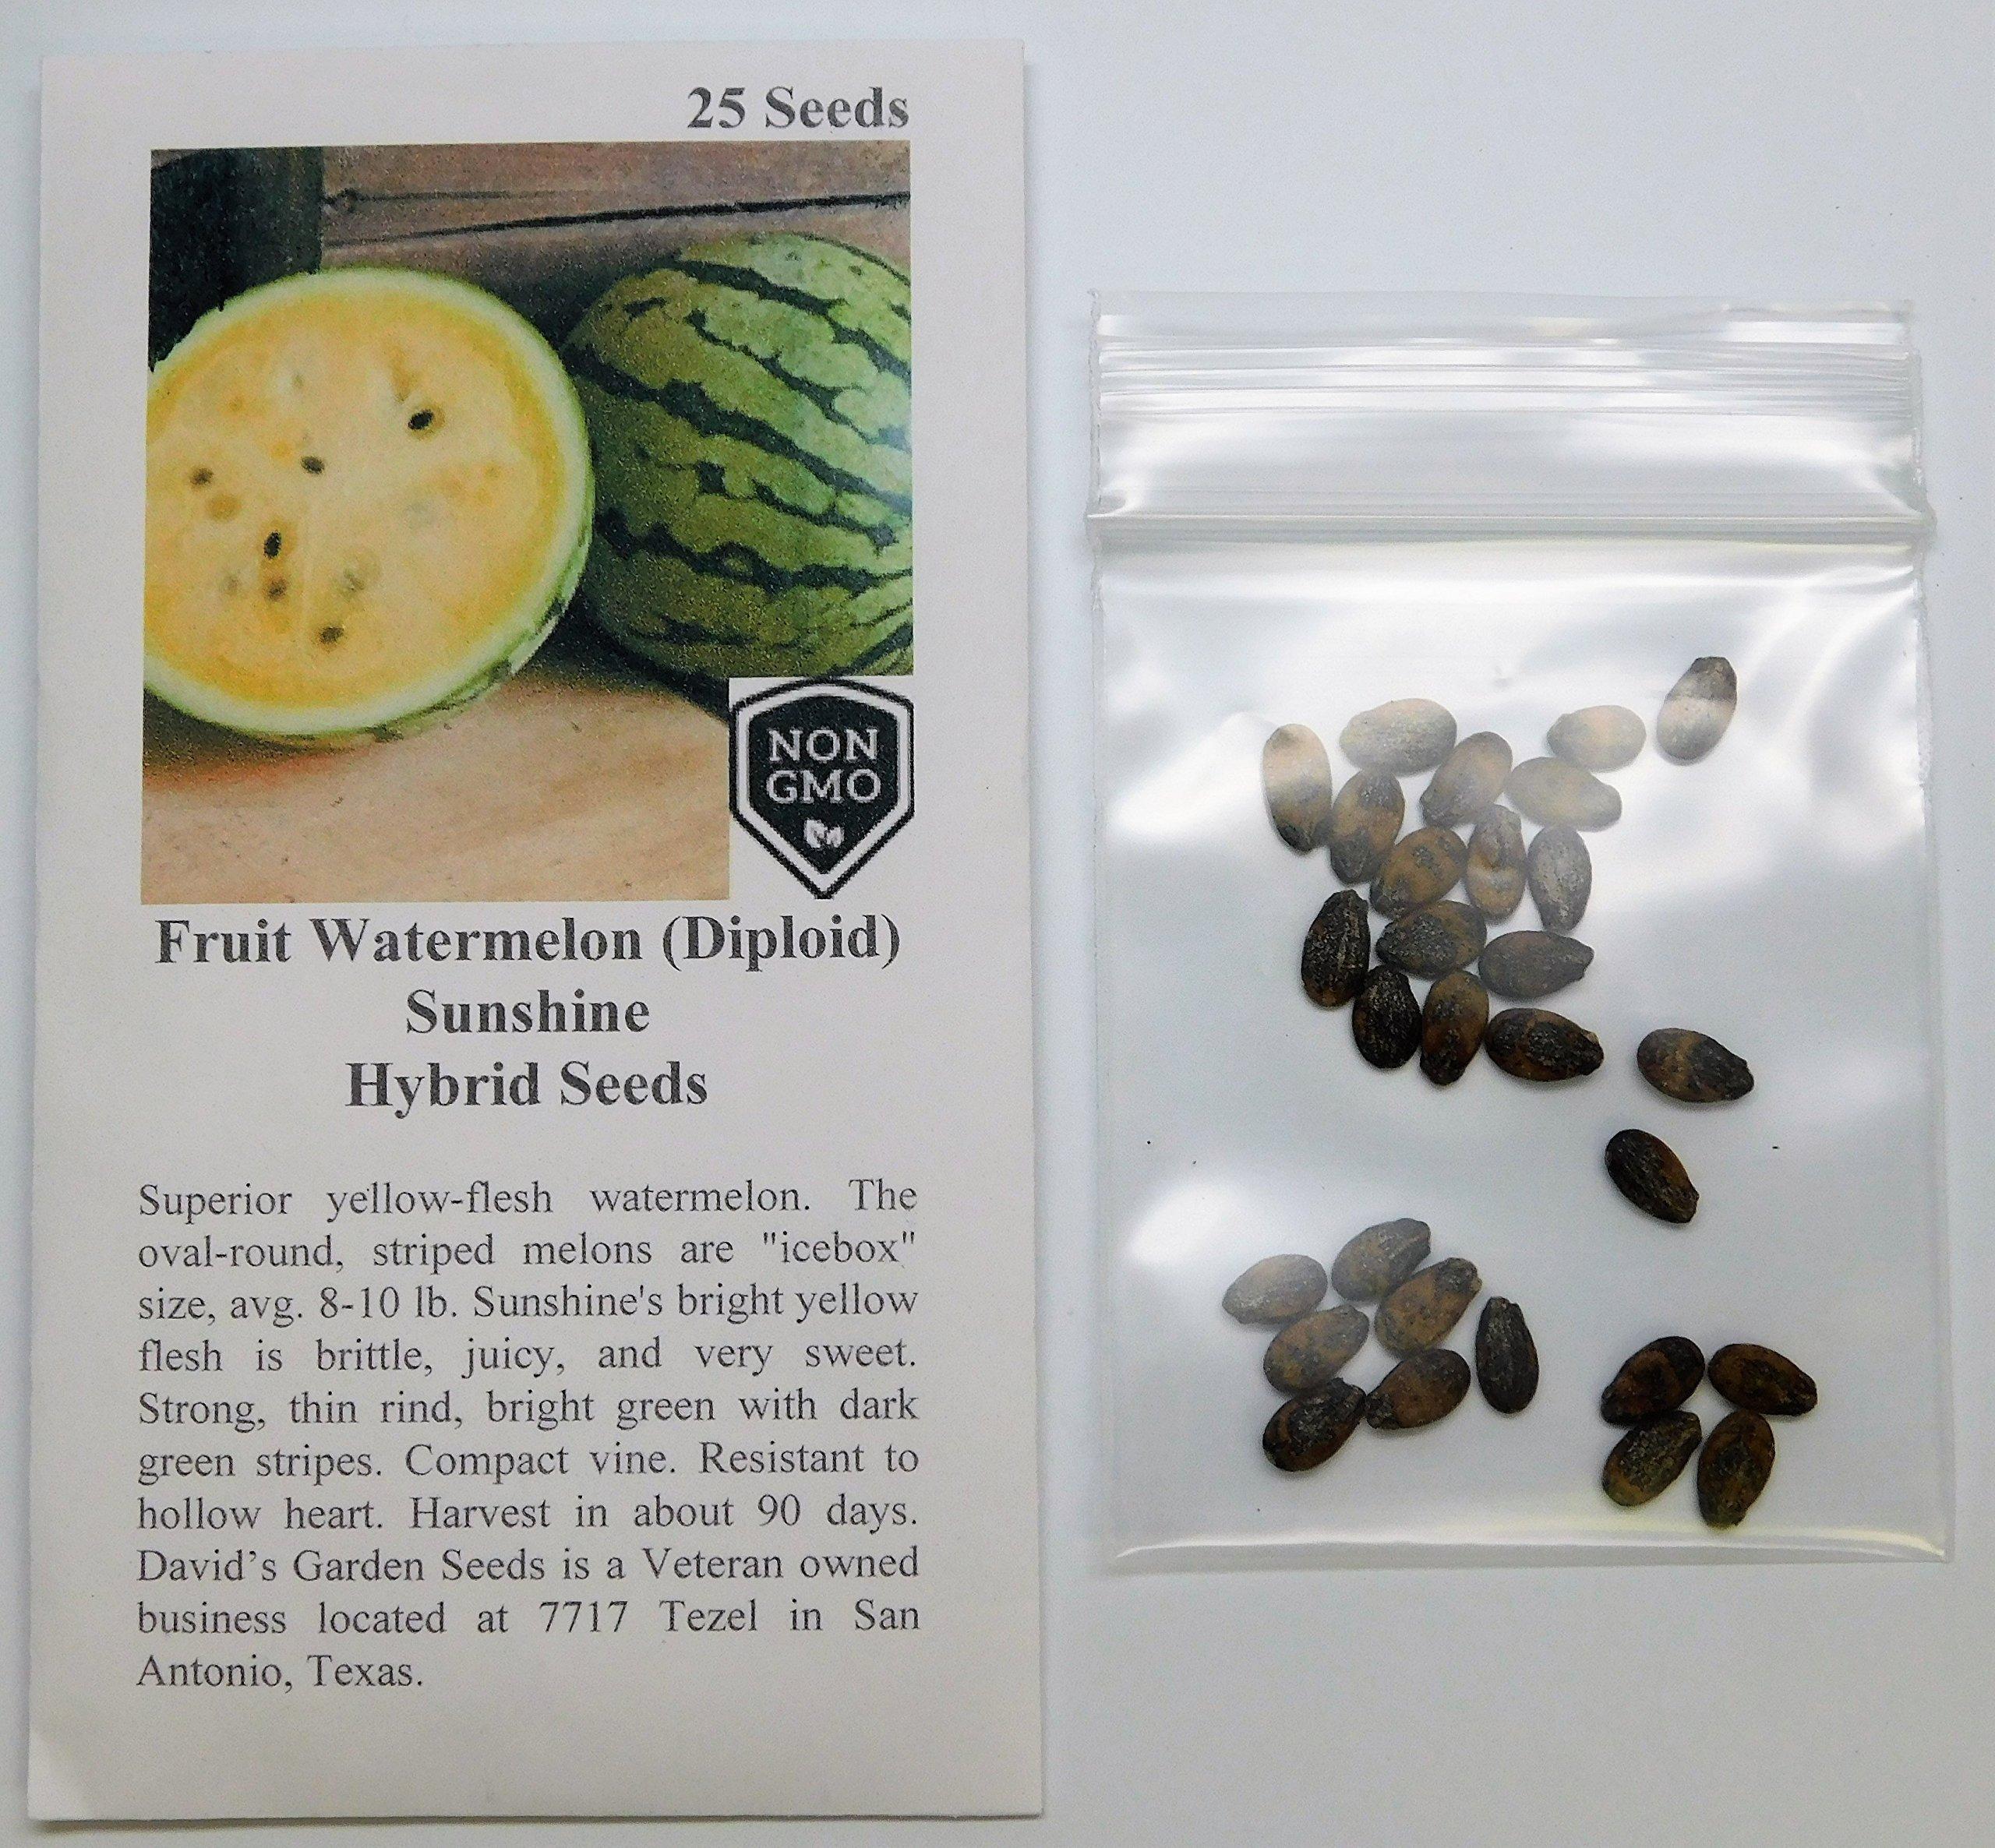 David's Garden Seeds Fruit Watermelon (Diploid) Sunshine AV0233 (Yellow) 25 Hybrid Seeds